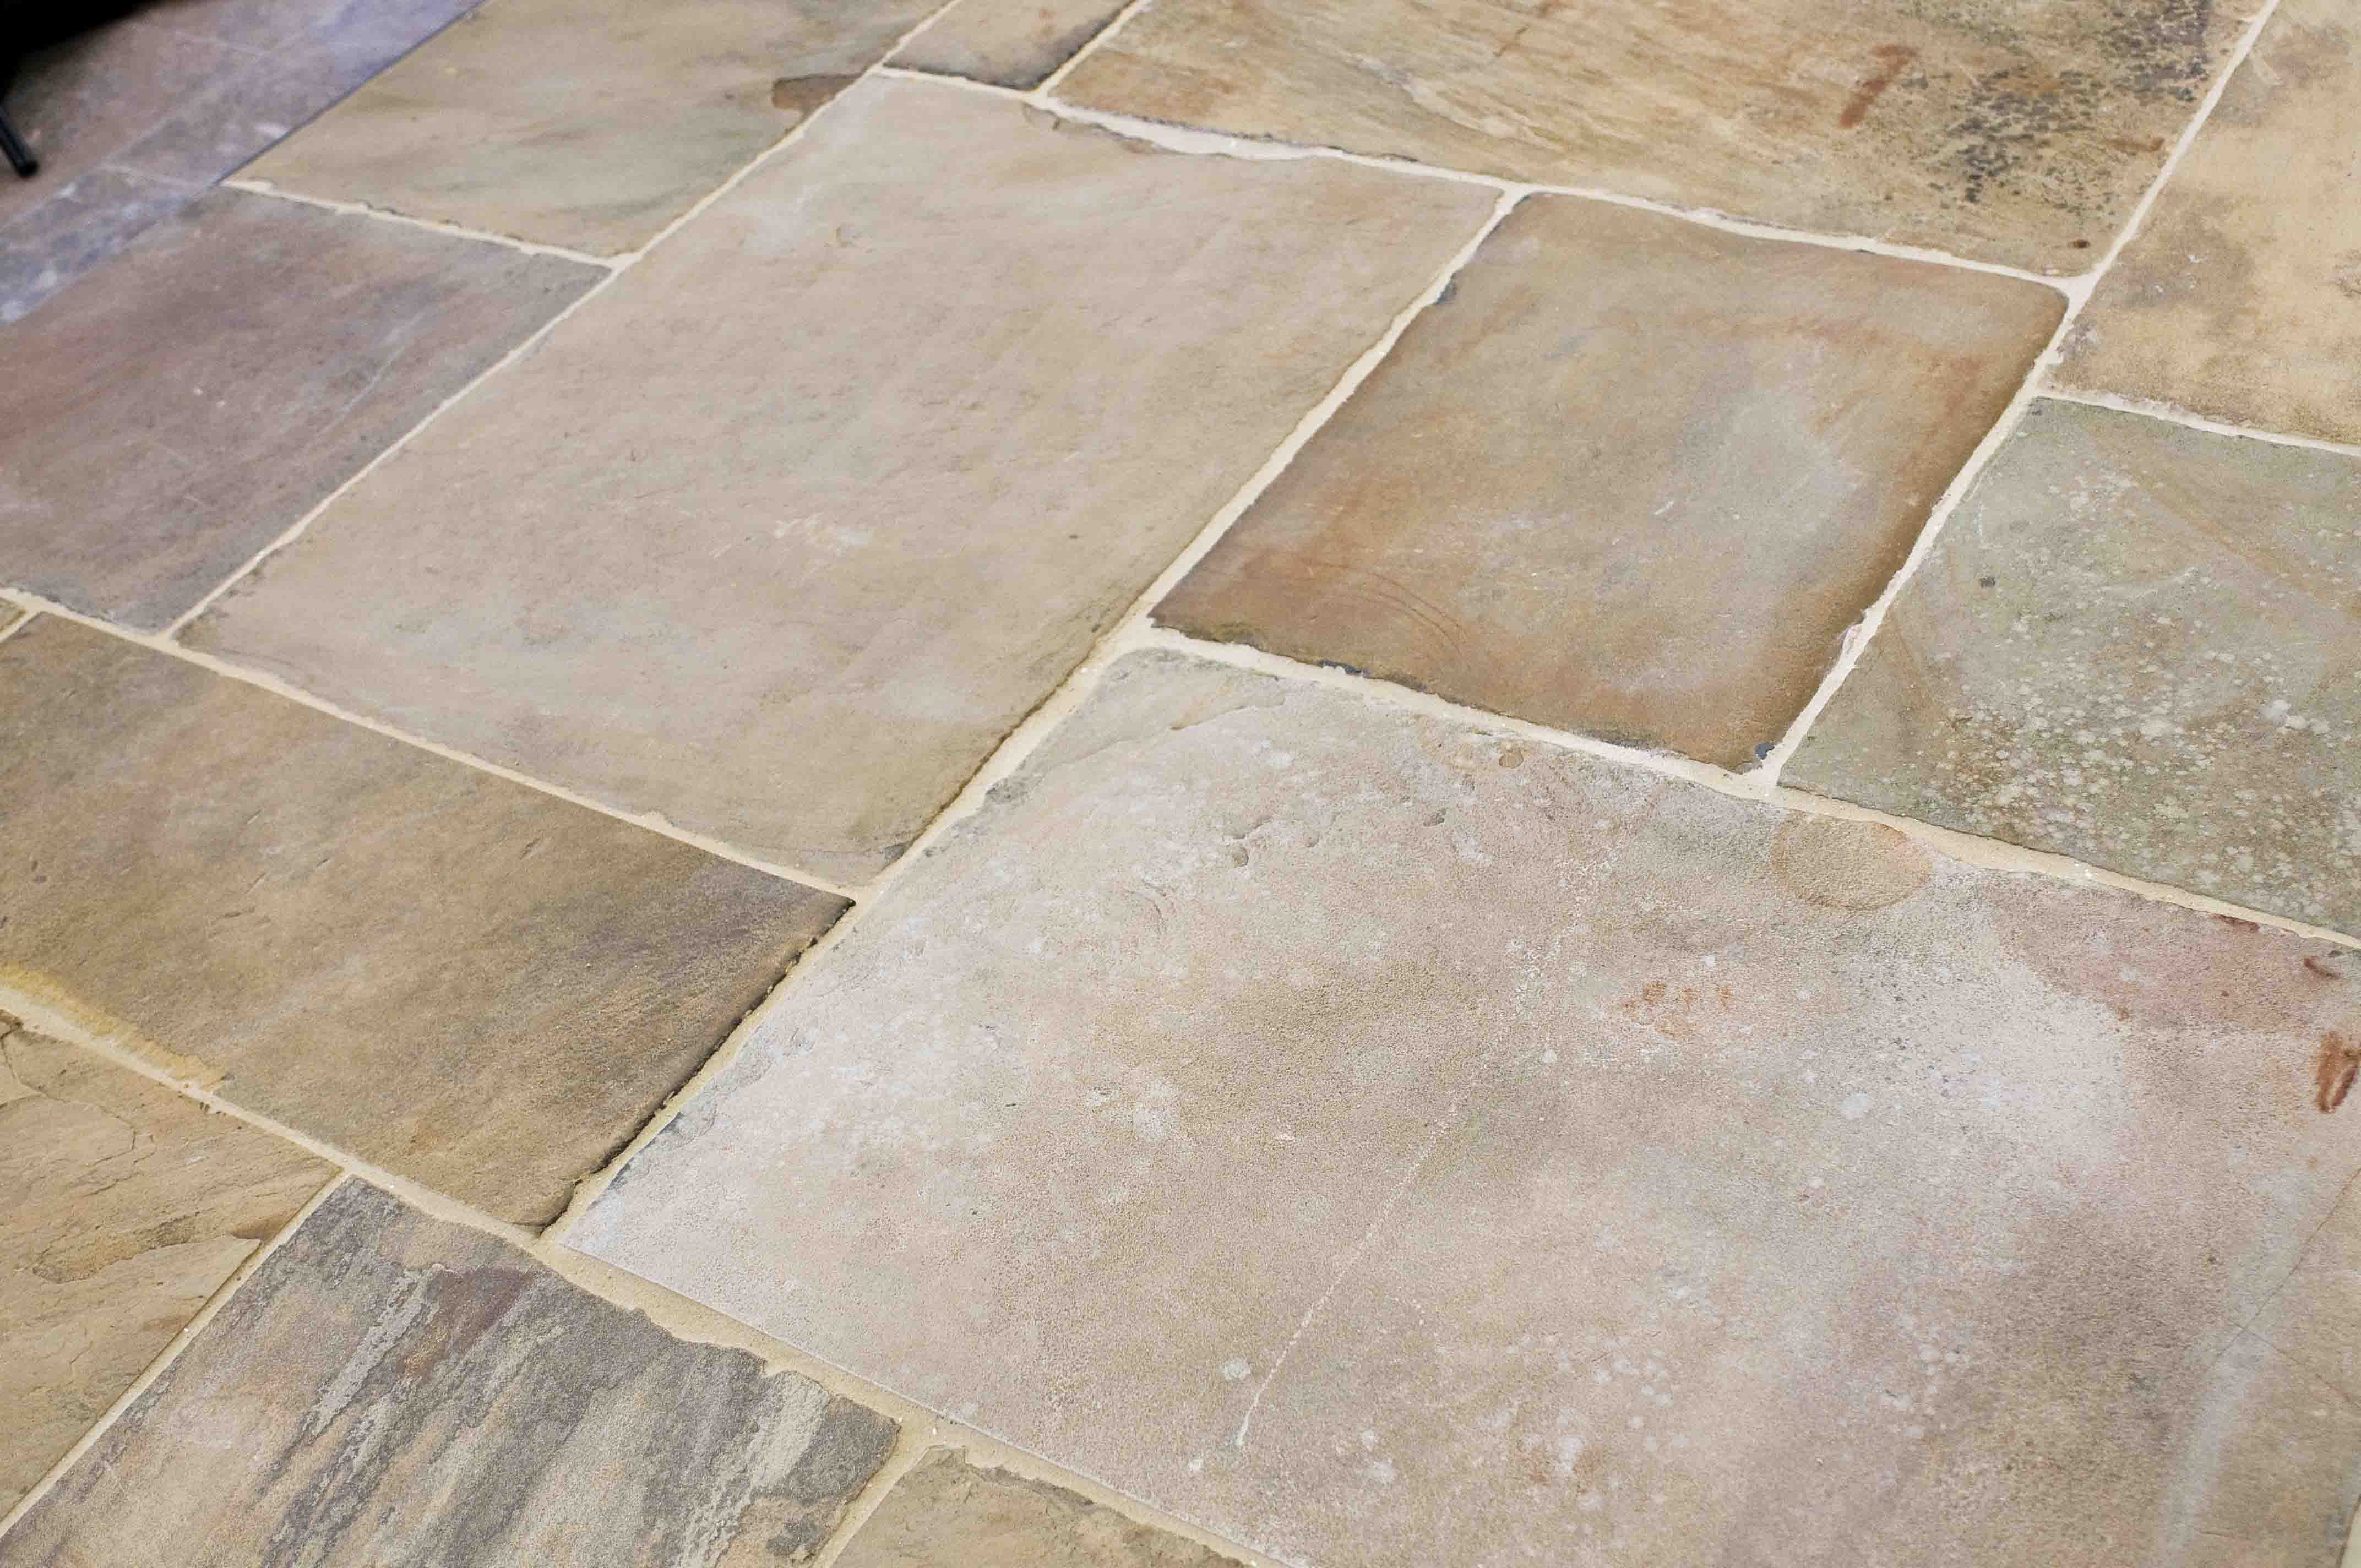 Accessories furnitureimpressive pale natural stone floor tile accessories furnitureimpressive pale natural stone floor tile for veranda tile floorbest dailygadgetfo Gallery